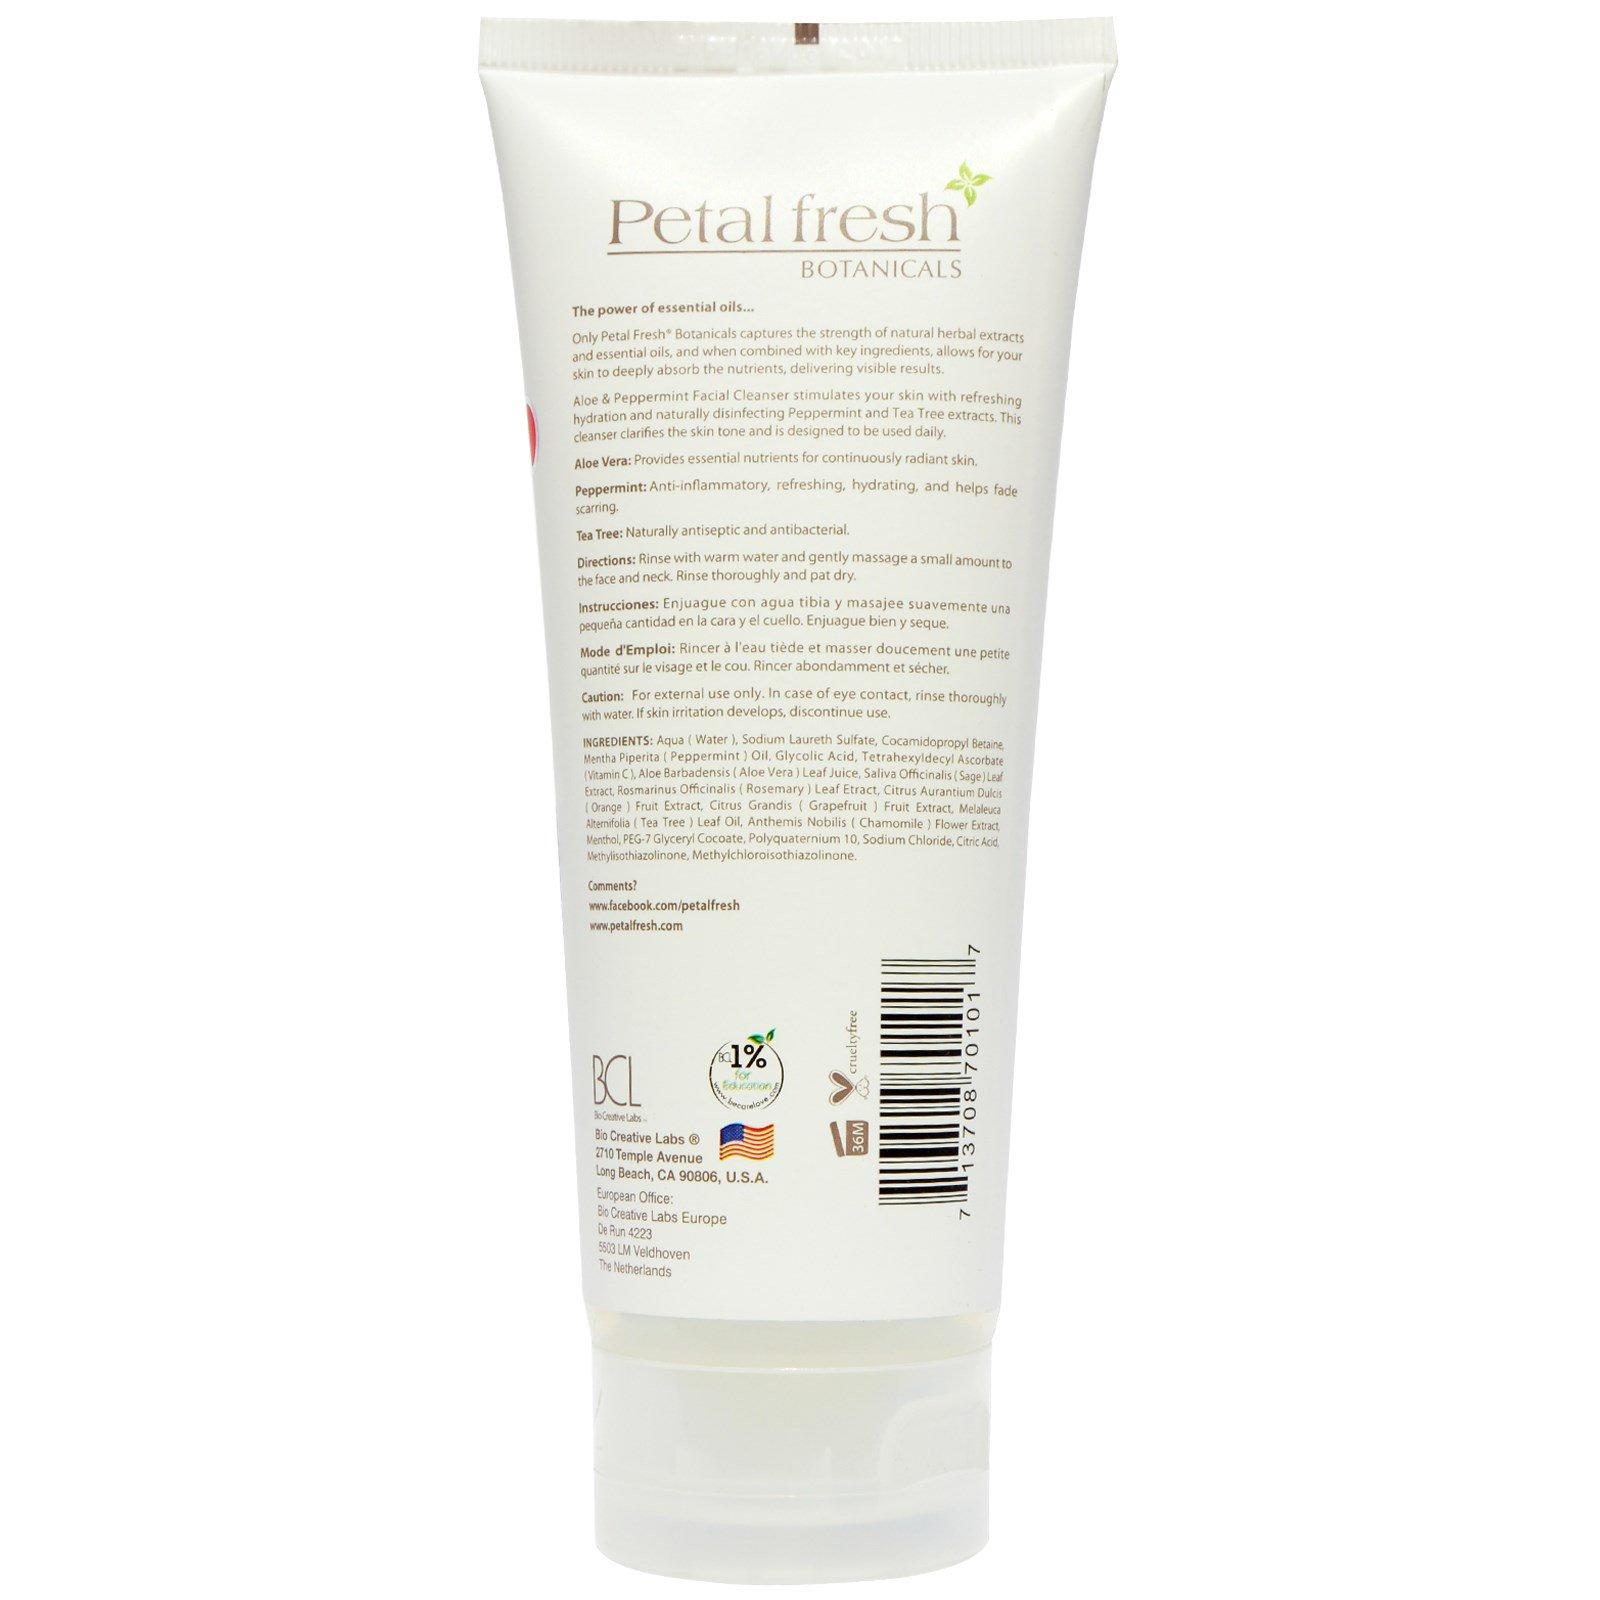 Petal Fresh, Age Defying Facial Scrub, Aloe & Pomegranate, 7 fl oz (200 ml) Bresh Diva Body Wipes for Women by BRESH, 3 Pack